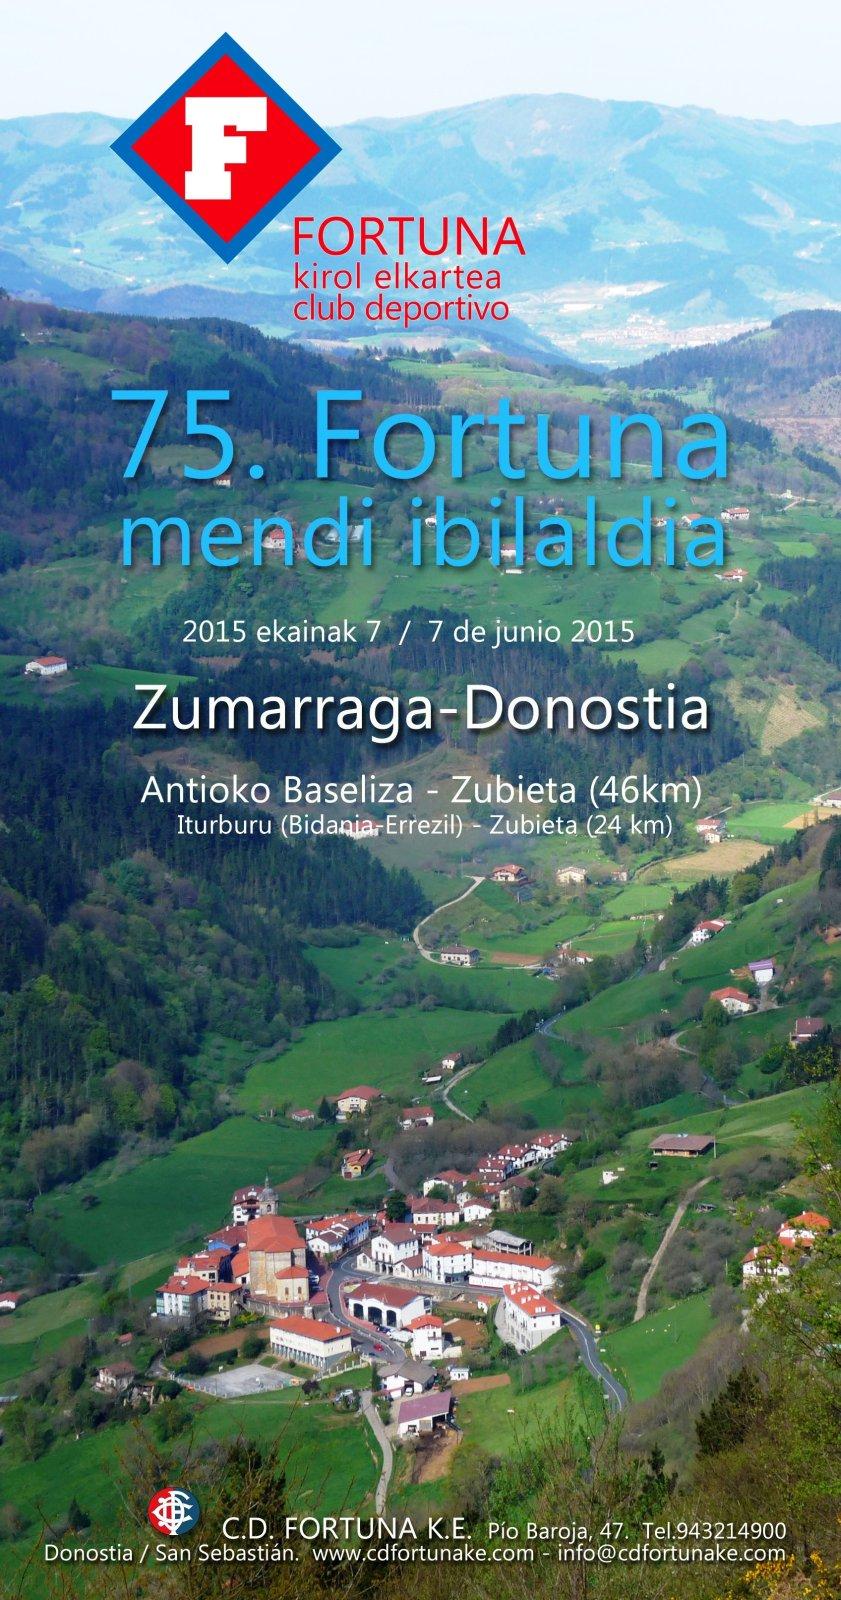 75 Fortuna mendi ibilaldidia